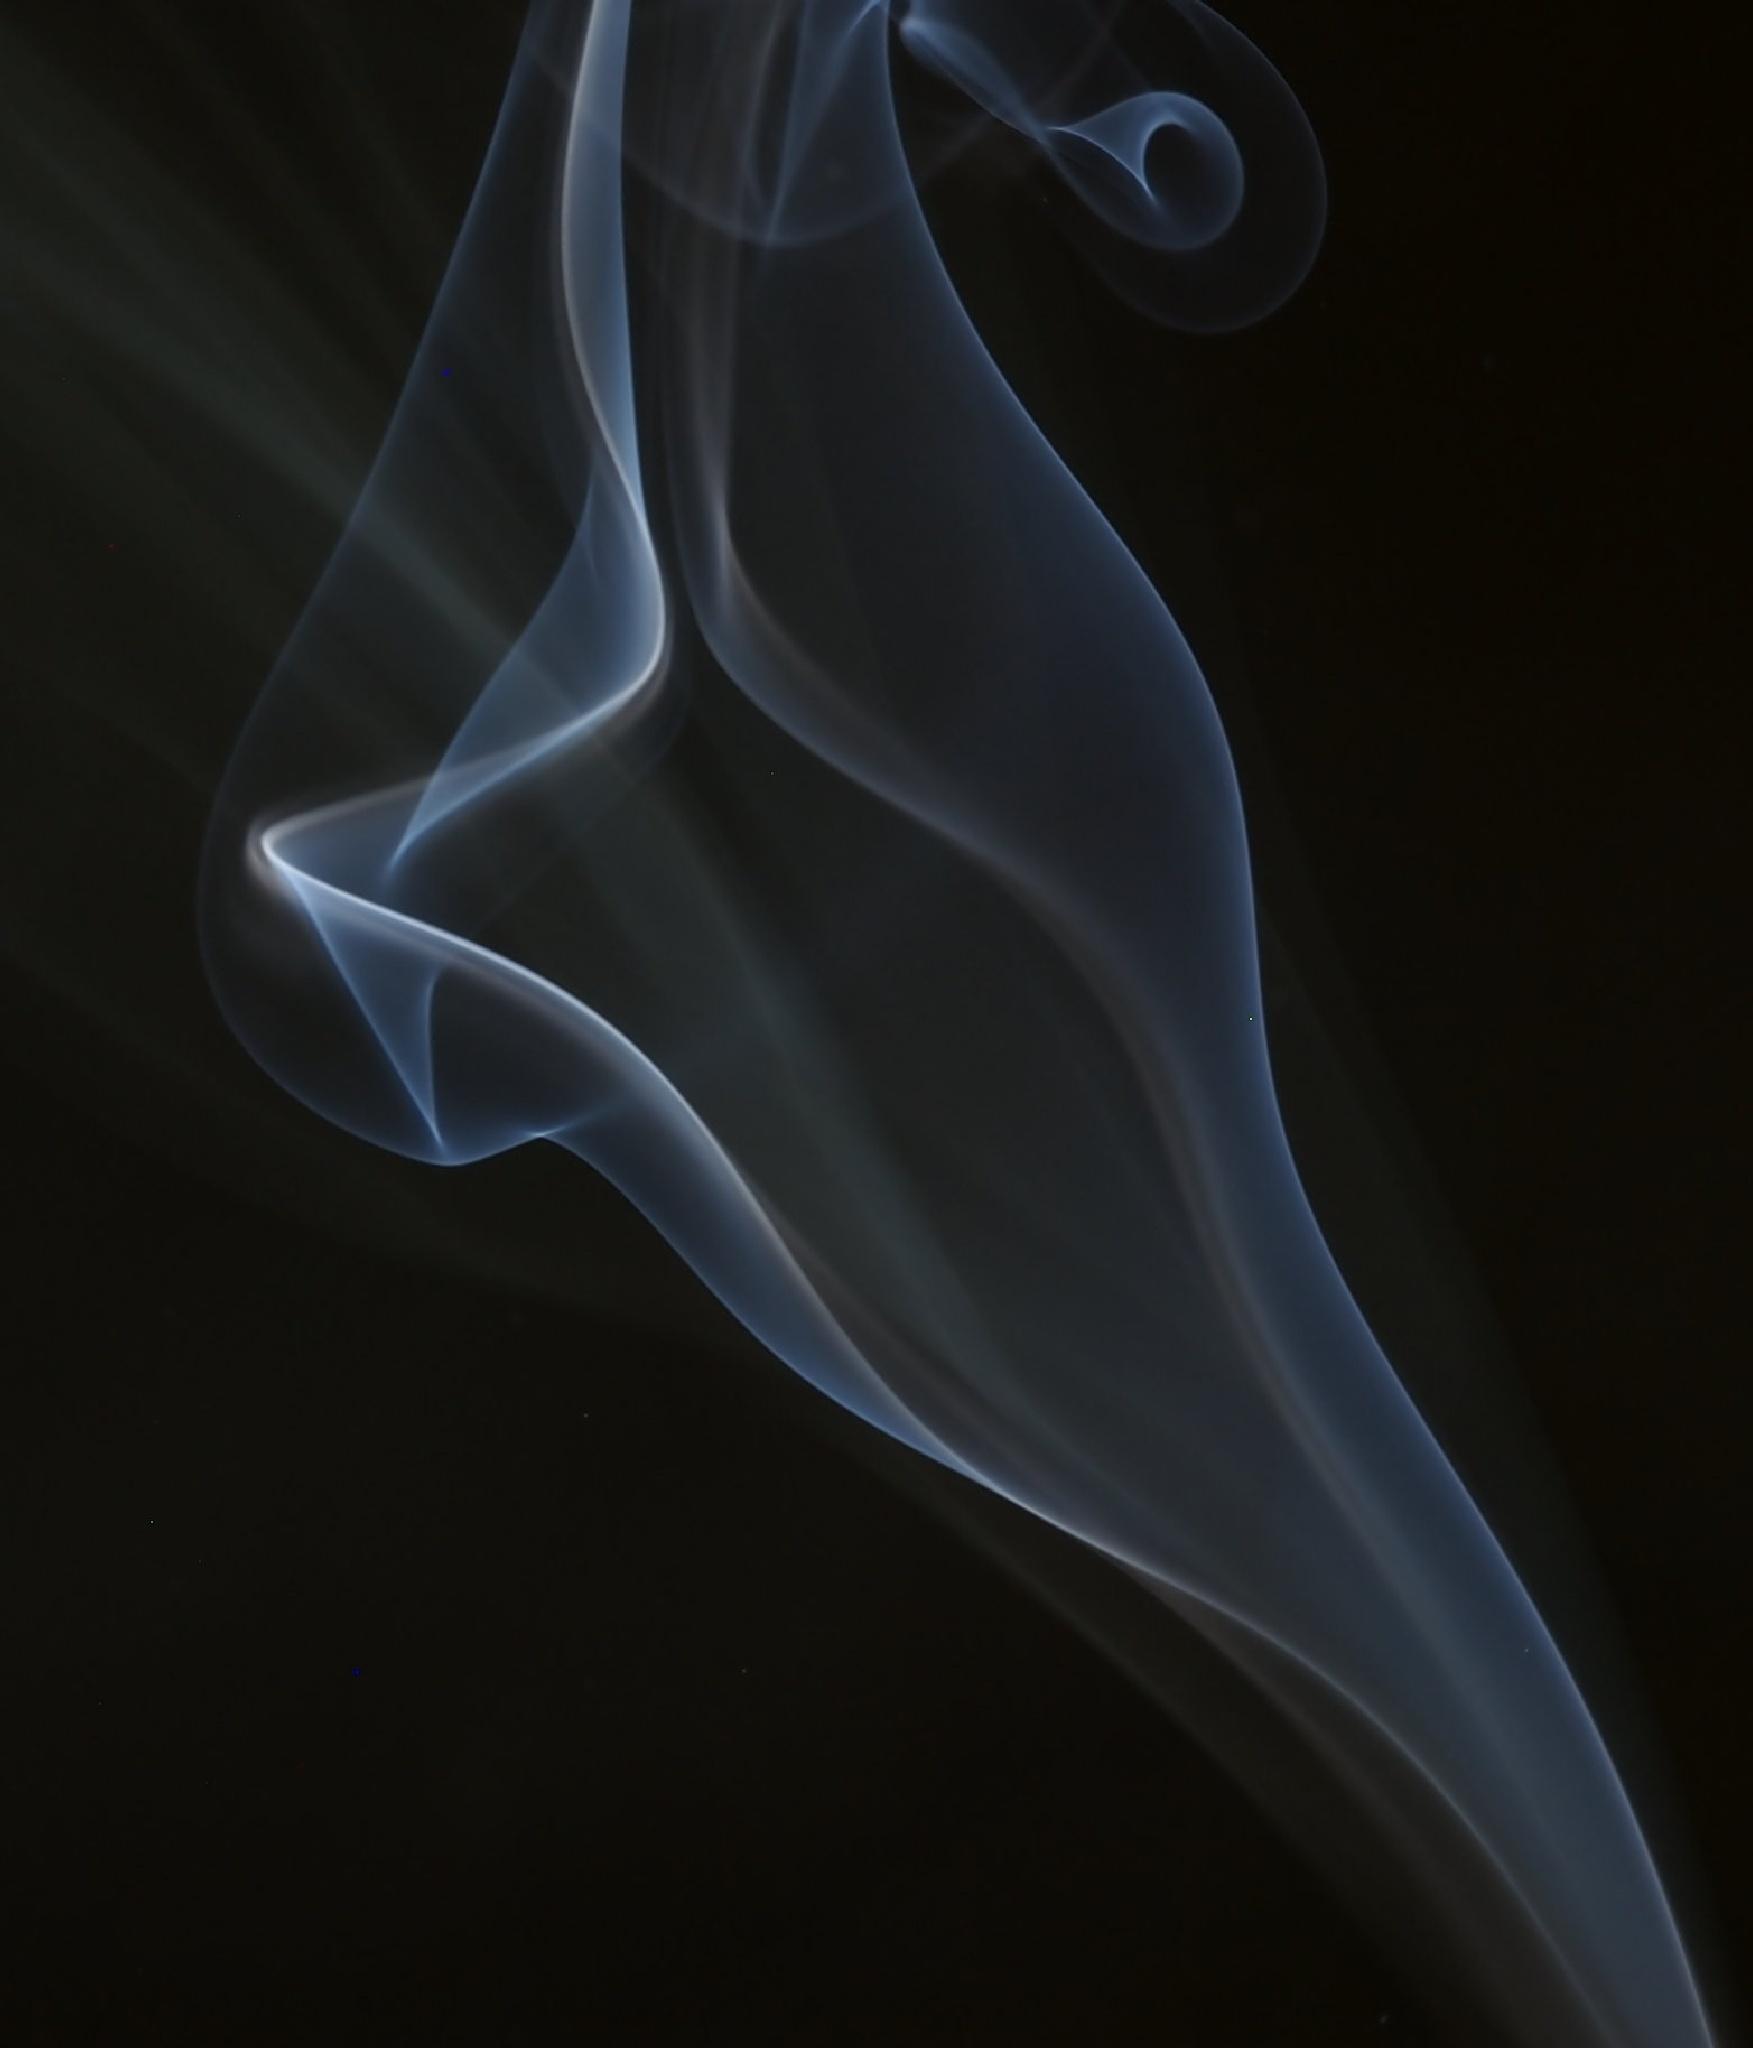 """Smoke Image #? "" by CharlieBaugh"